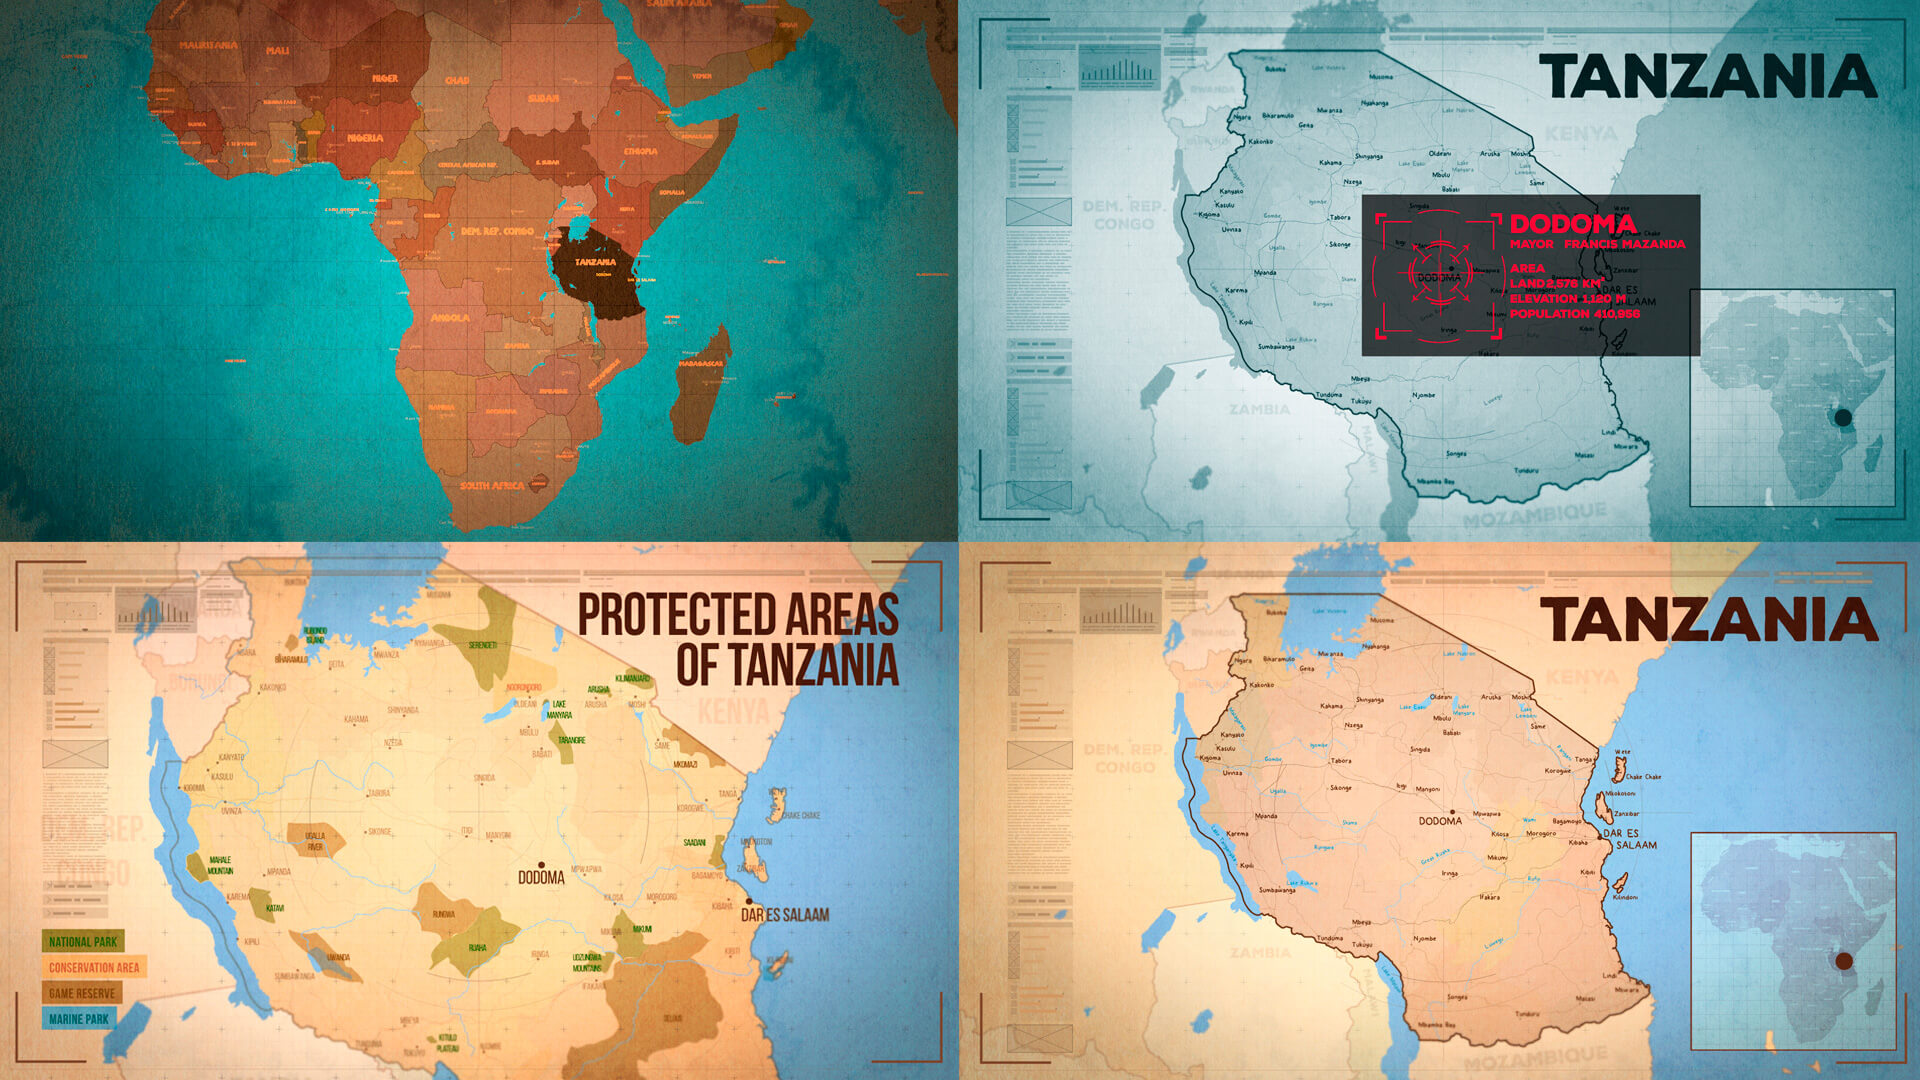 Tanzania_Map_1